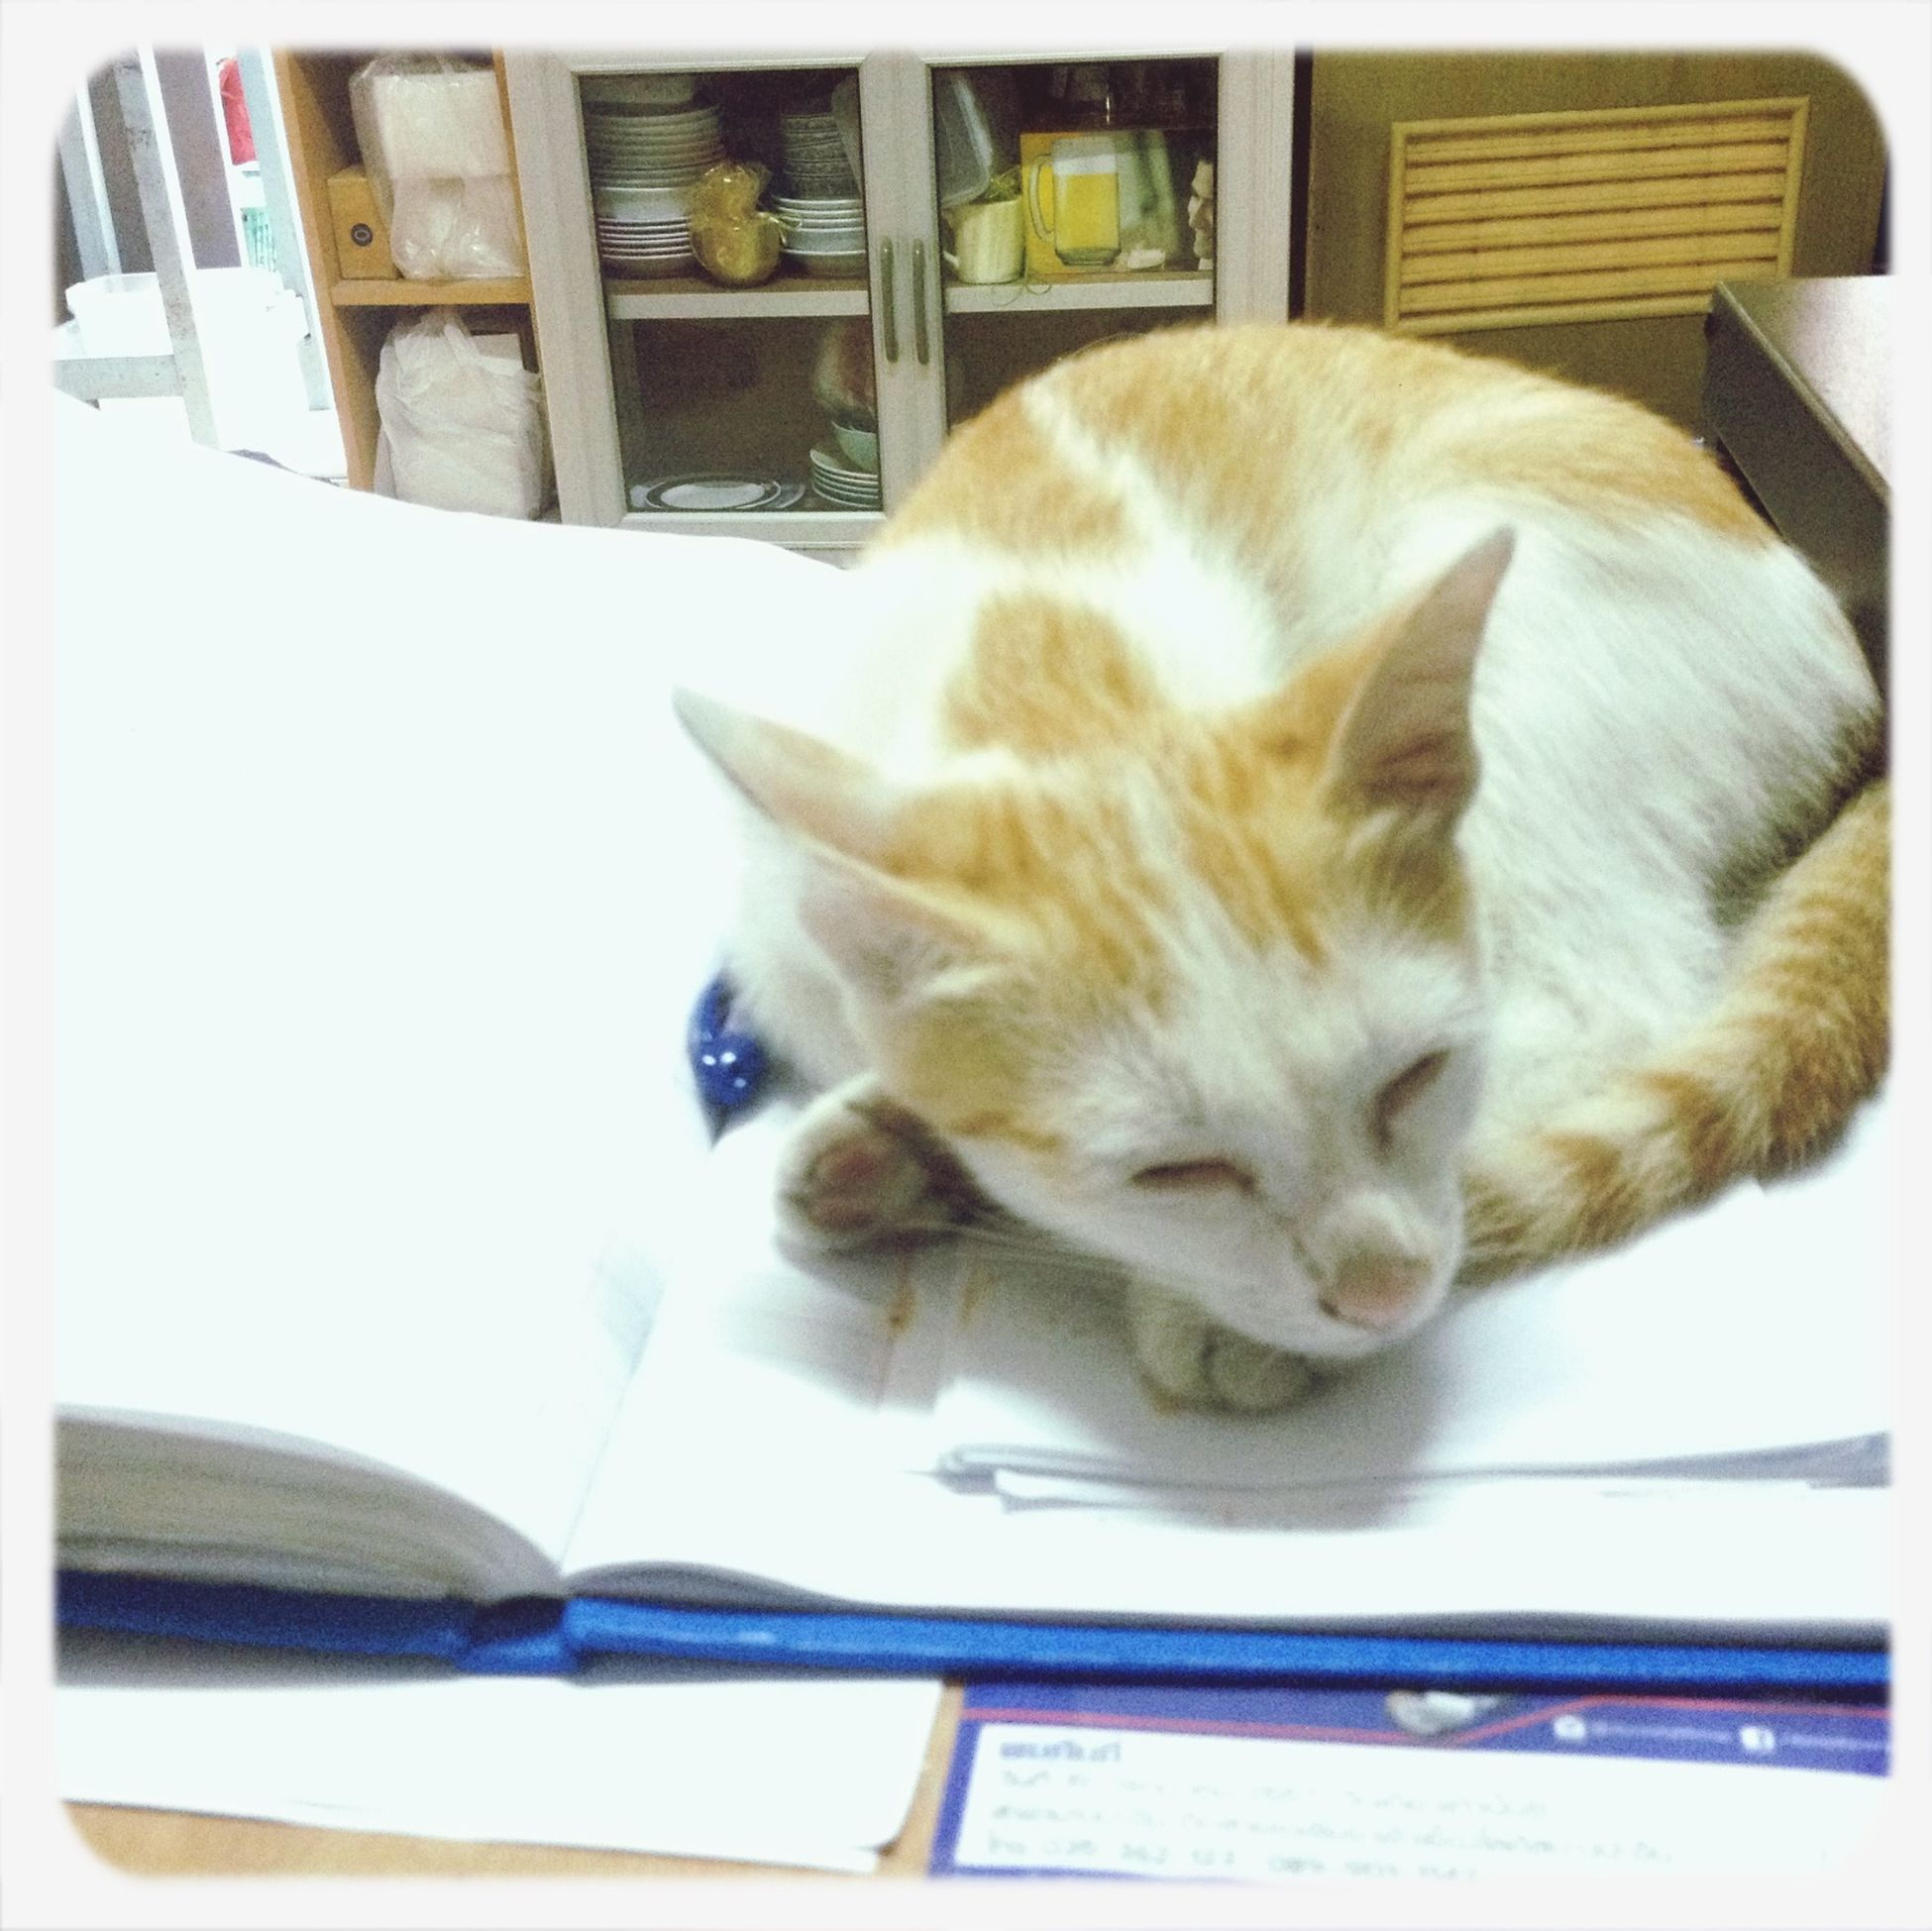 Sleeping Cat พนักงานบัญชี โชติรสอพาร์เมนท์ ห้องพักกว้าง สะอาด สะดวก ปลอดภัย ติดถนนใหญ่ ใกล้นิคมบางปะอิน สนใจเชิญสอบถามได้นะคะ ะคะ ]